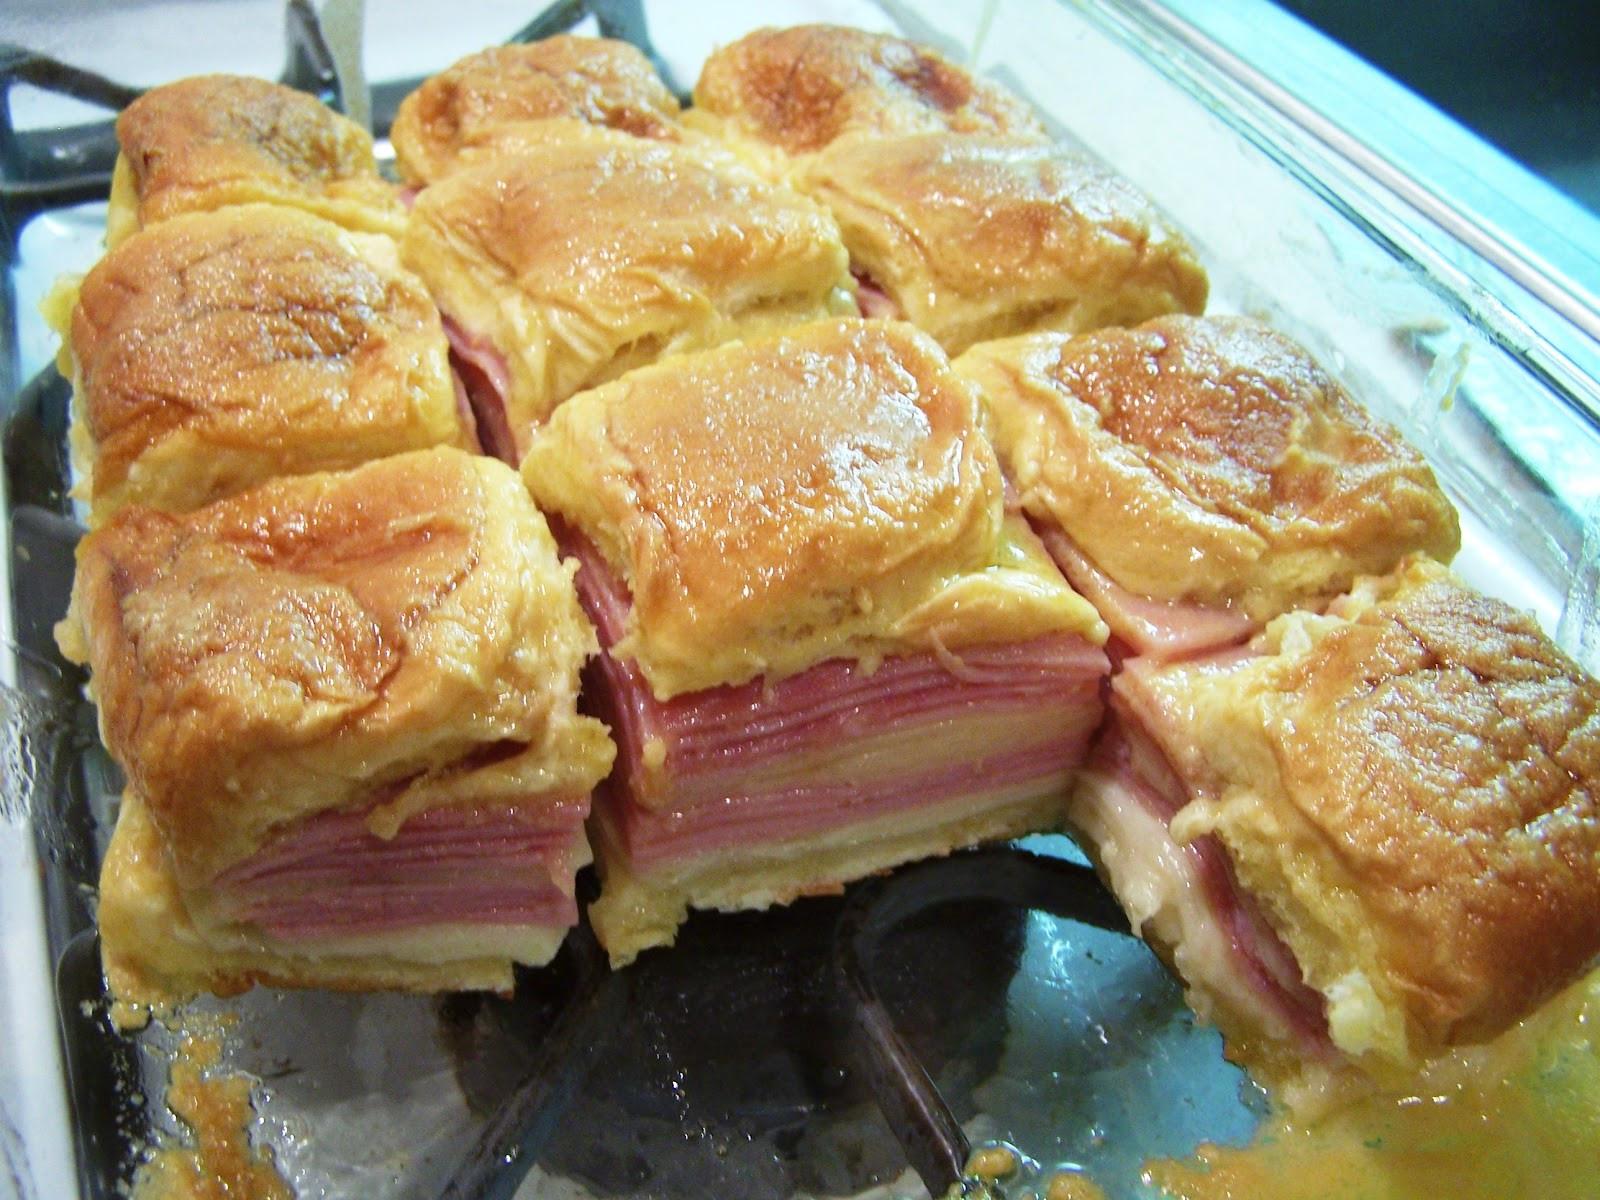 Hawaiian Bread Ham Sandwiches  Cooking What I Pin Hawaiian Baked Ham and Swiss Sandwiches